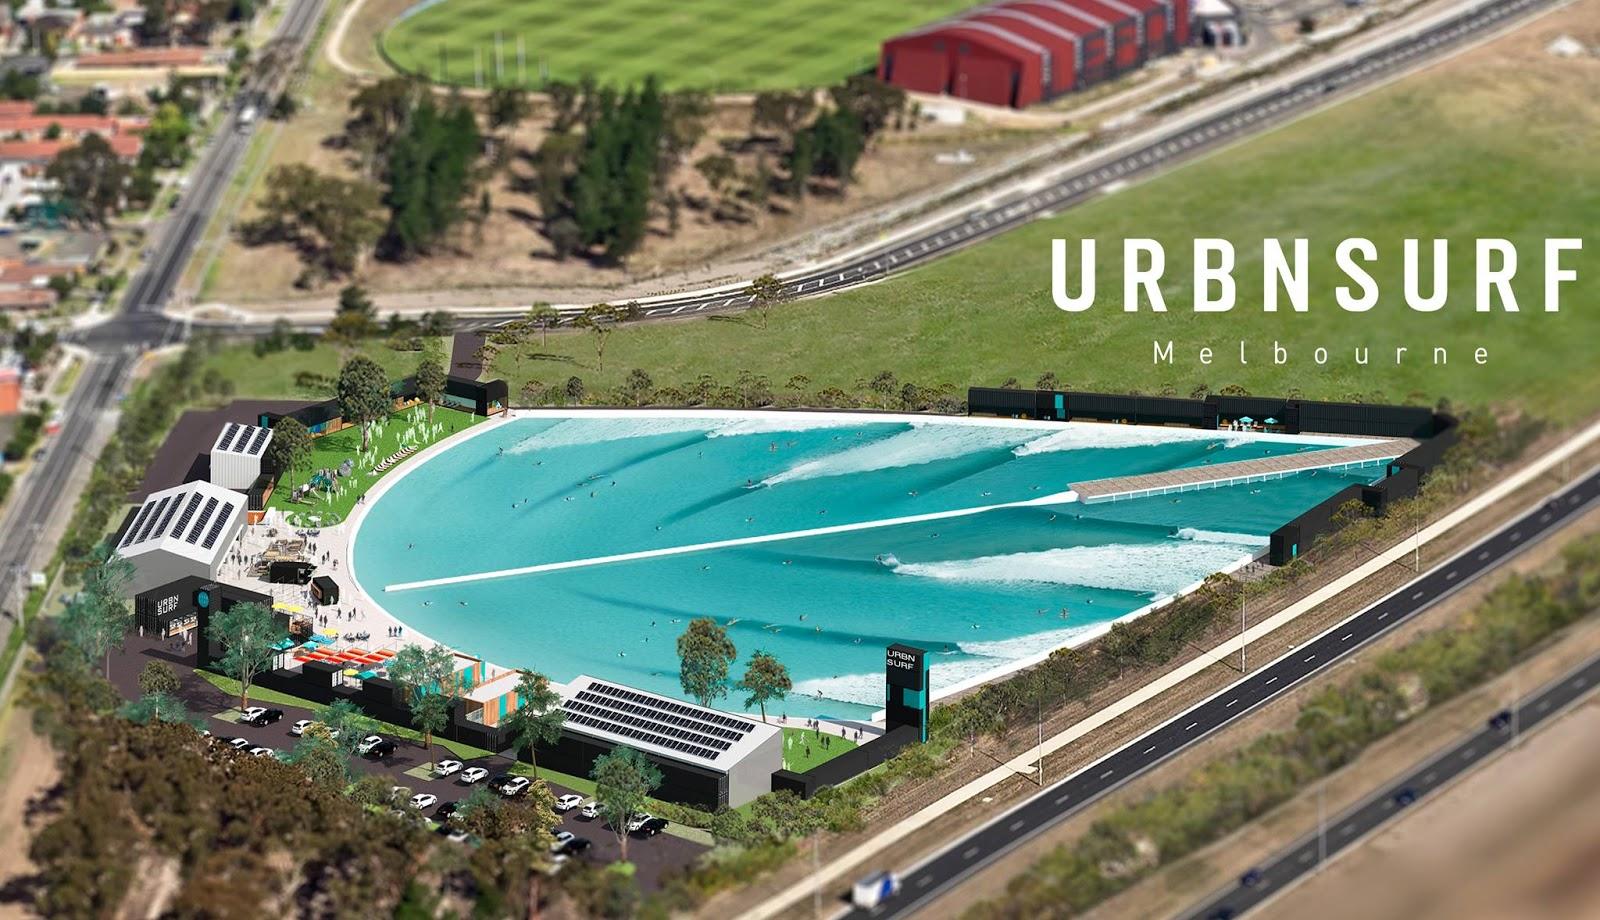 URBNSURF Melbourne Australia s first surf park